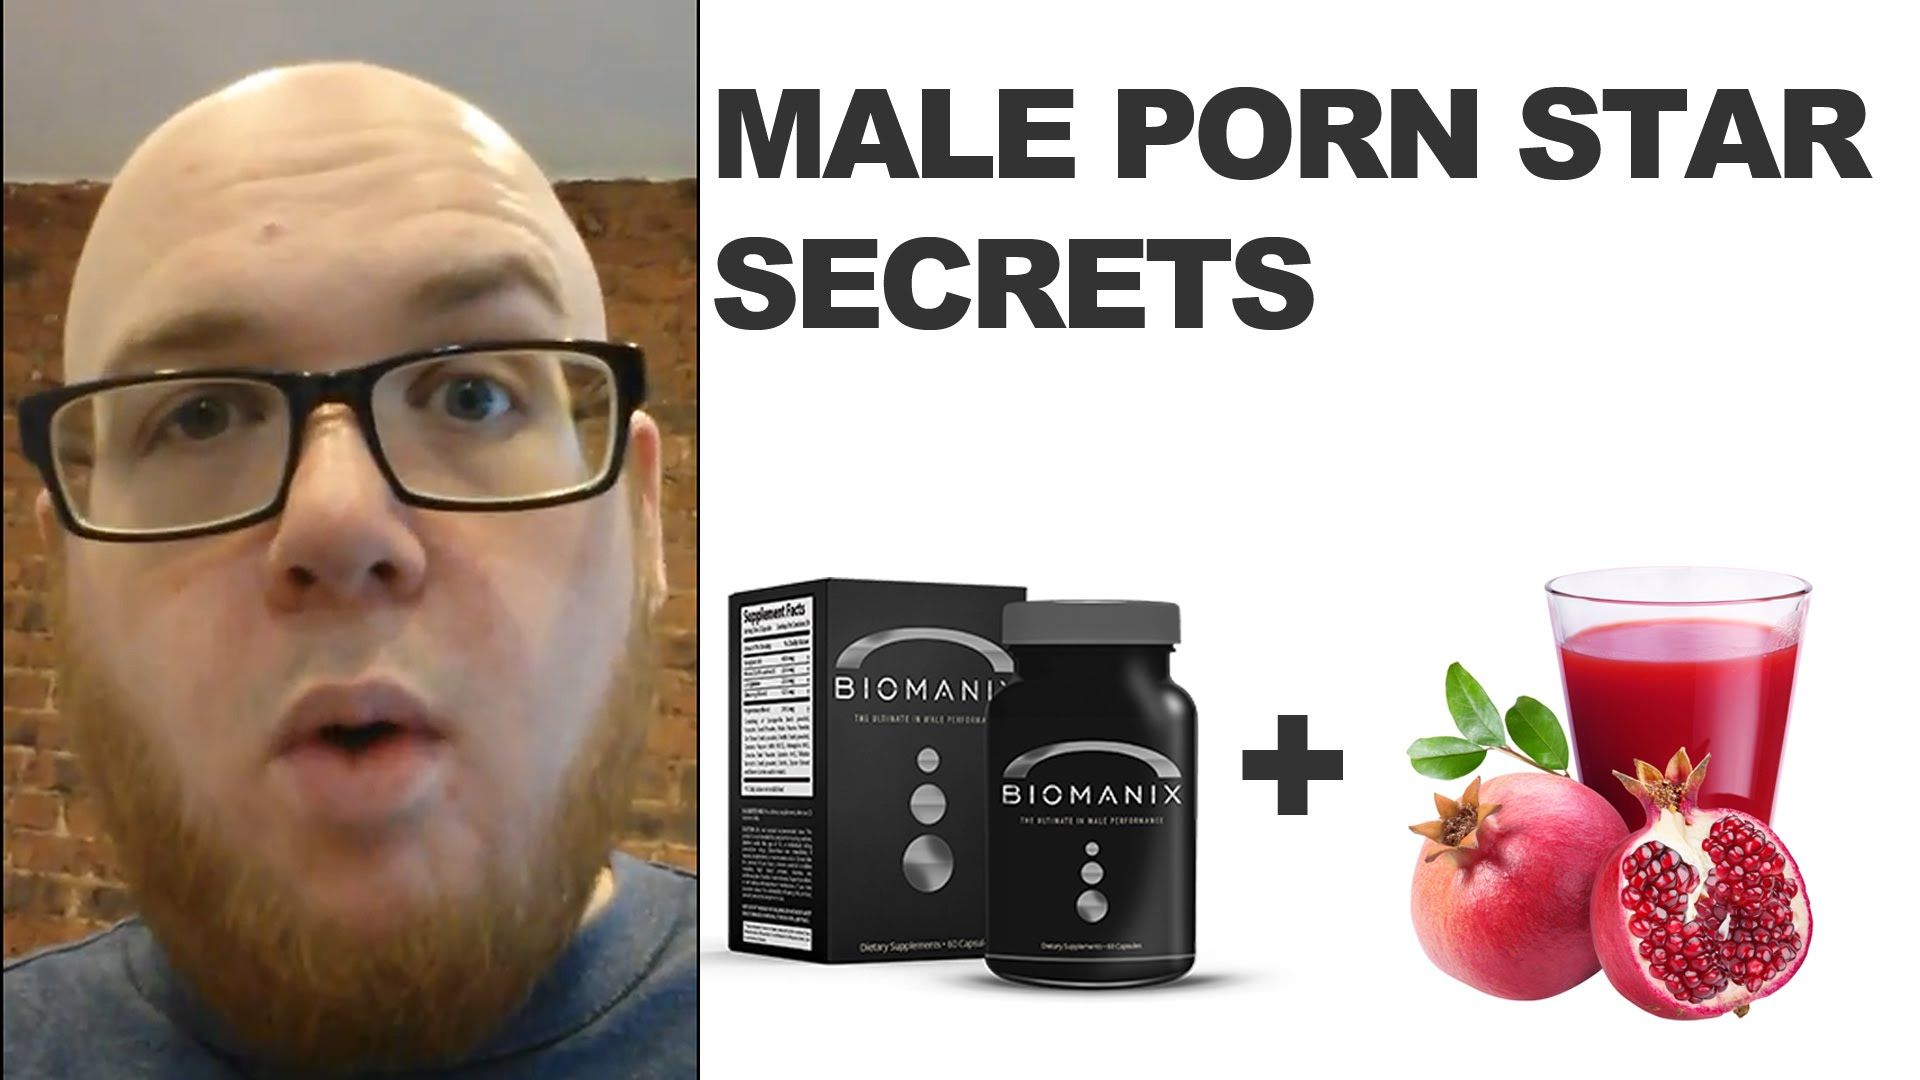 Female clitoris video